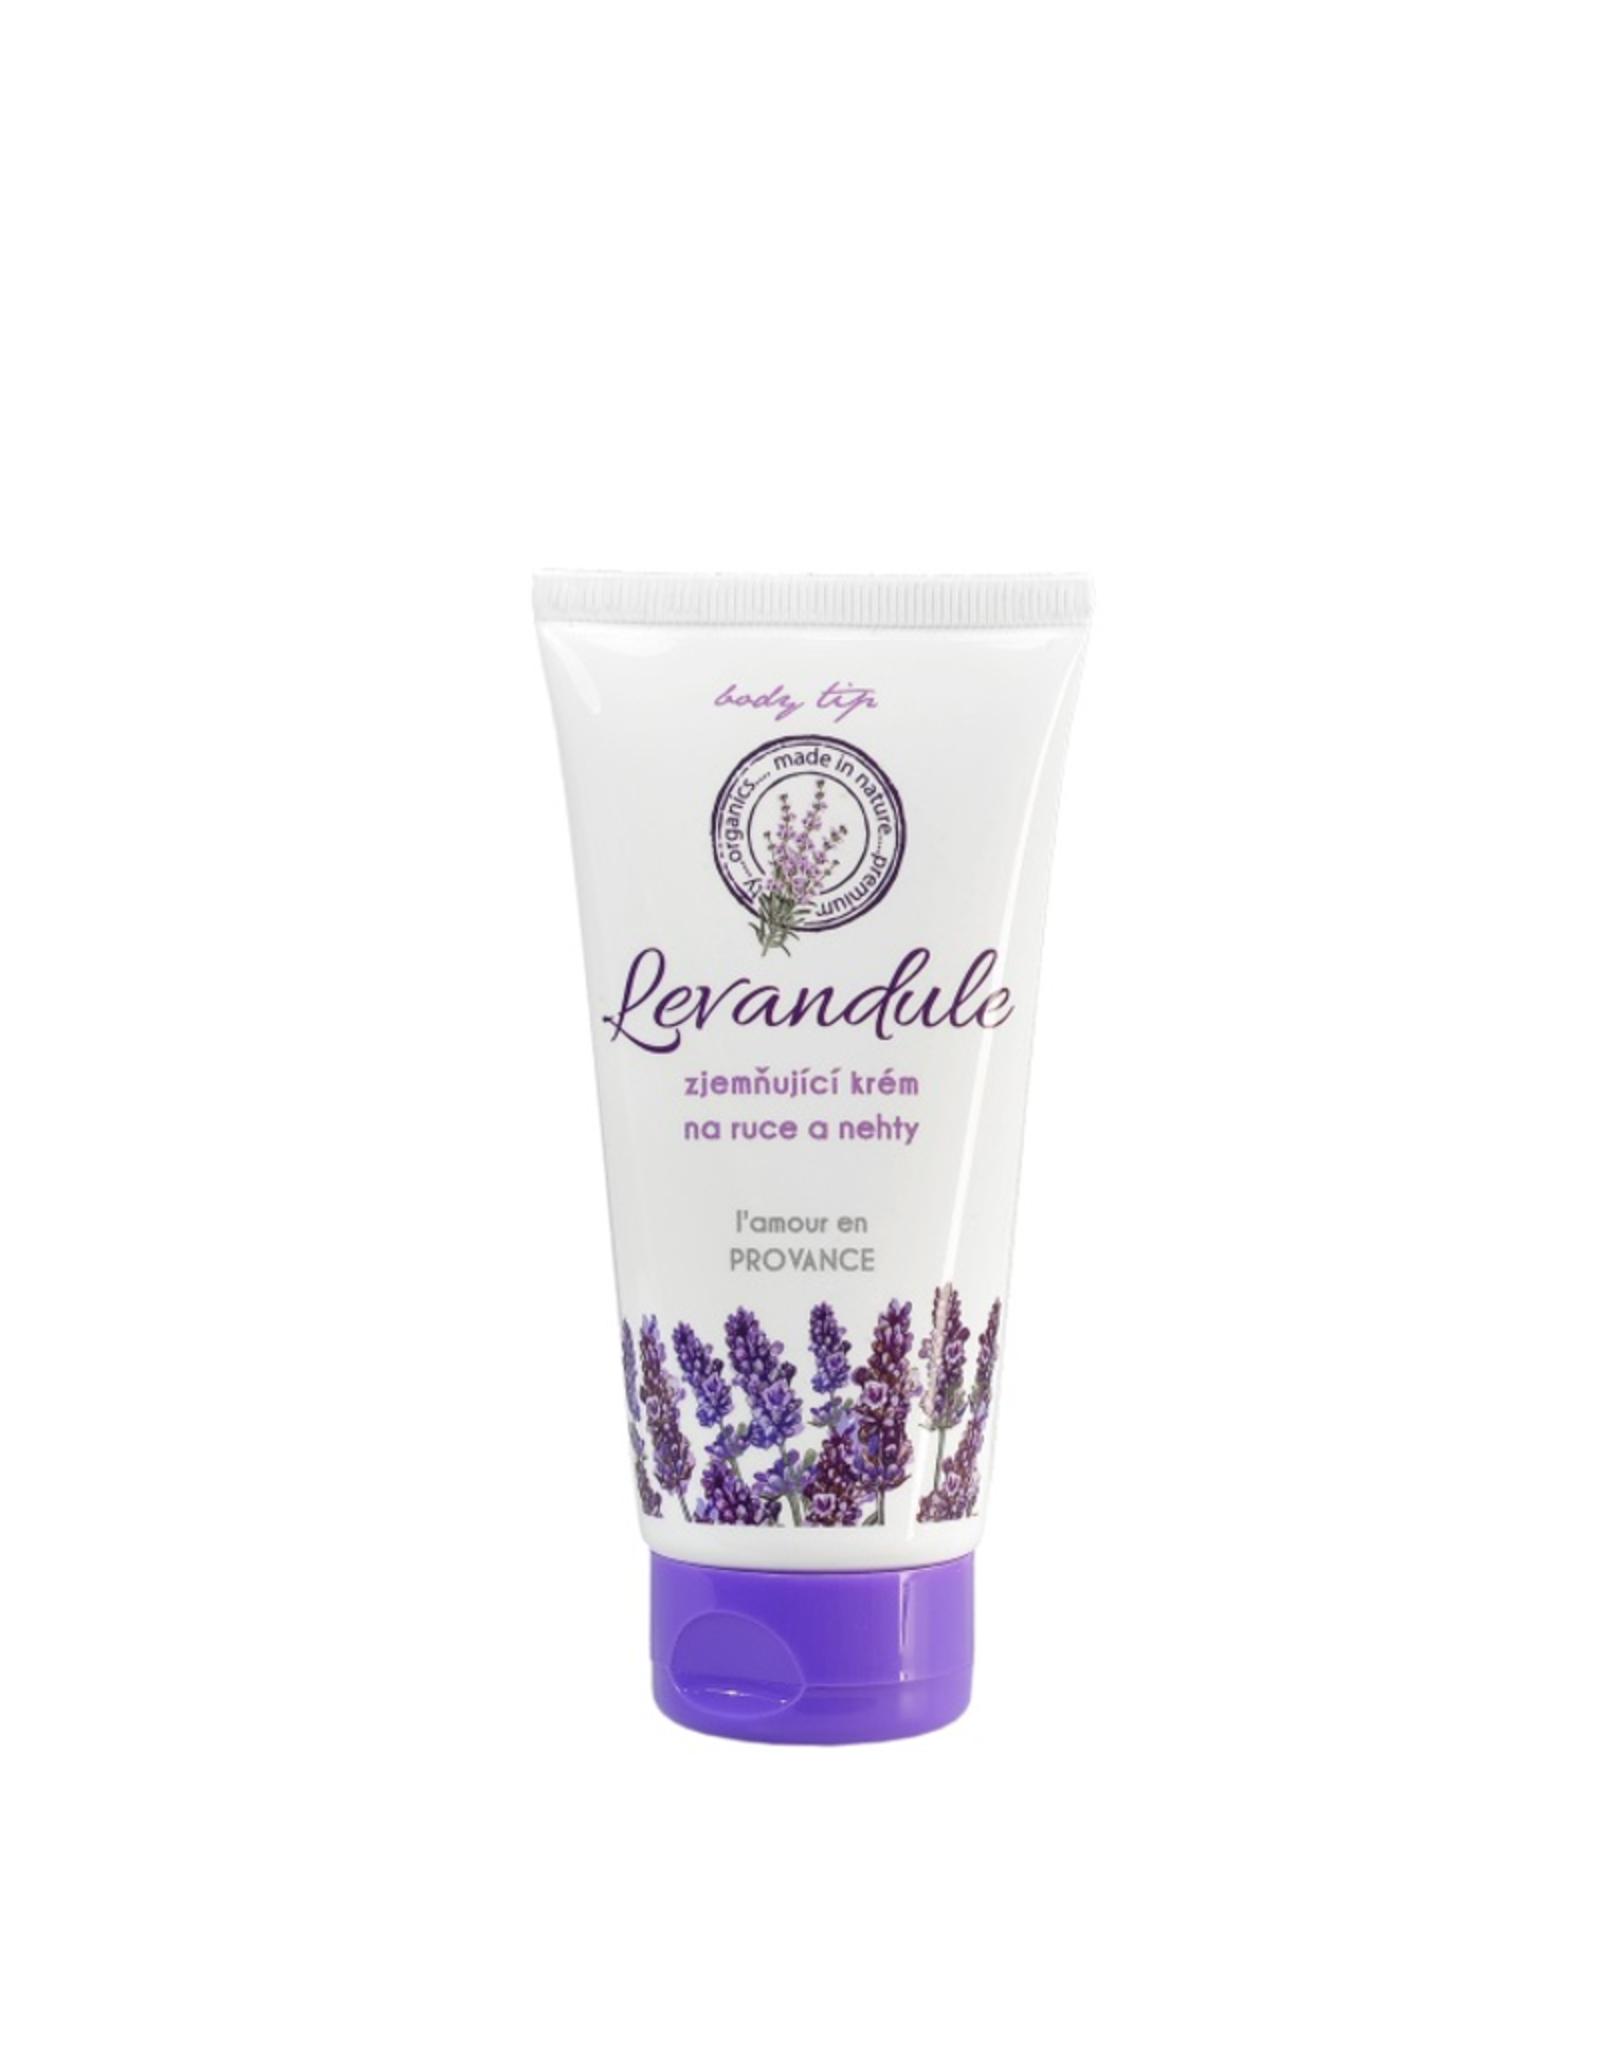 BODY TIP PREMIUM Verzachtende Handcrème  en Nagelcrème met Lavendelolie